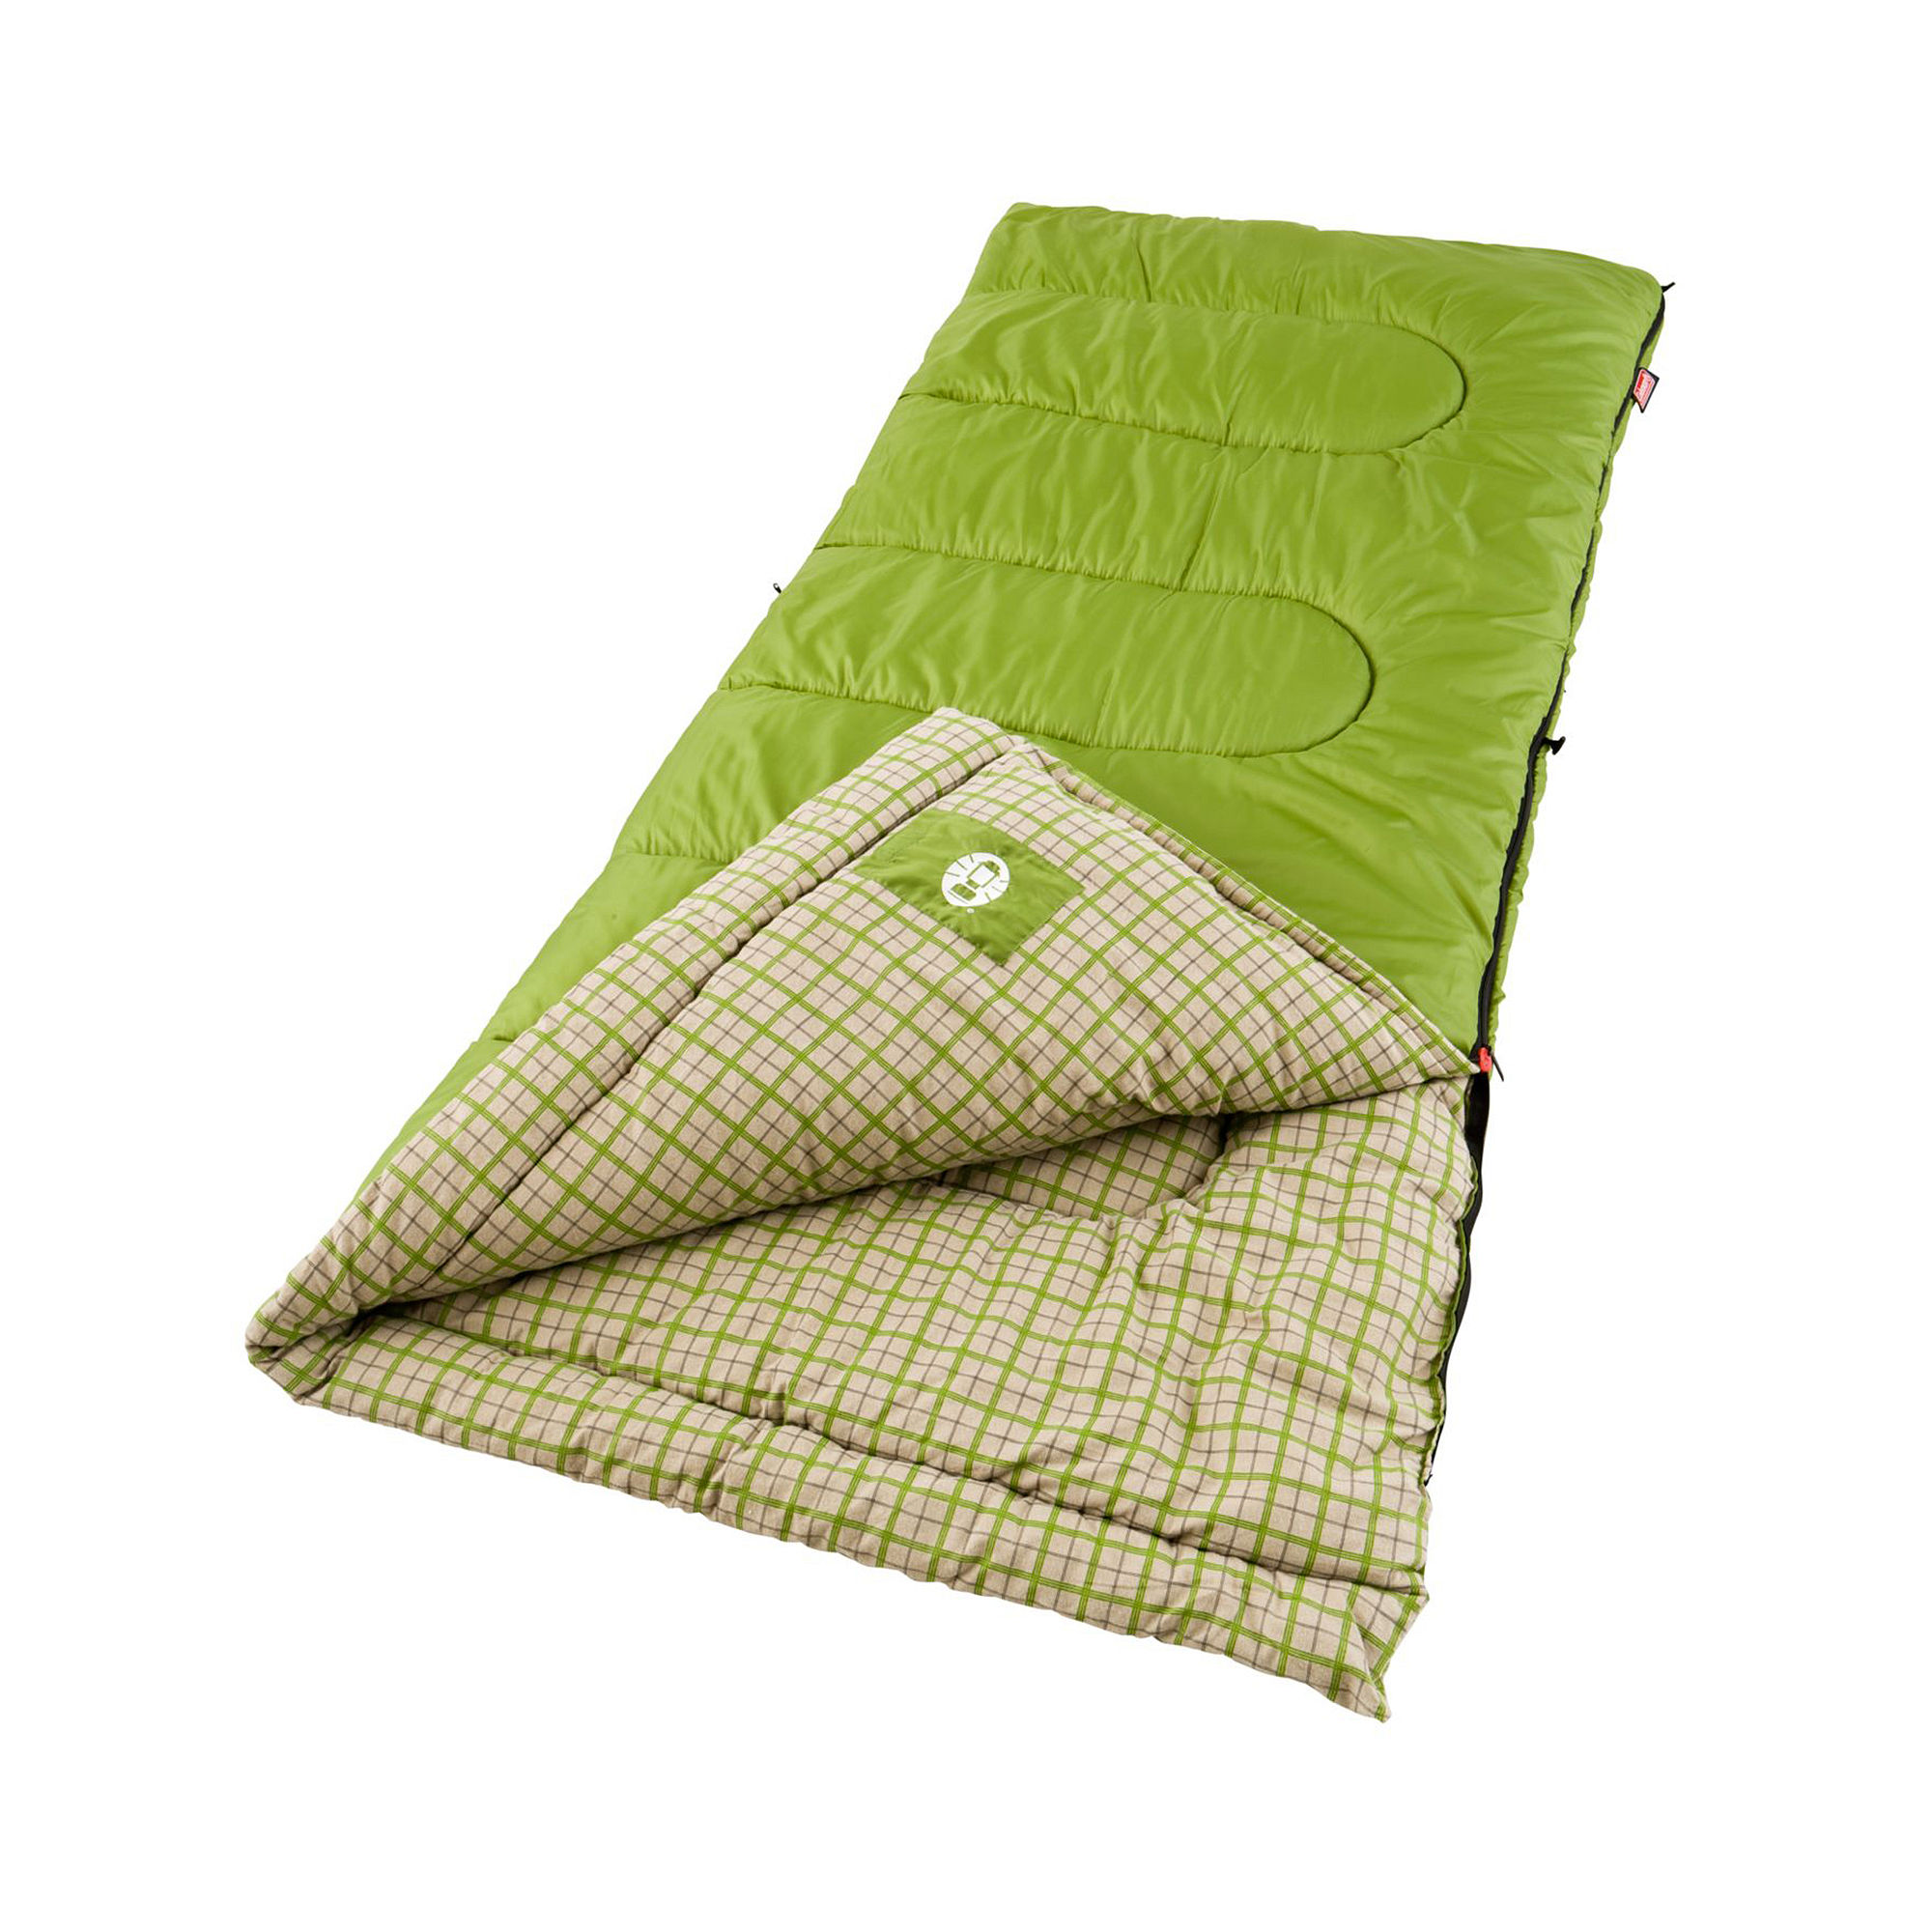 "Coleman Green Valley"" Sleeping Bag"